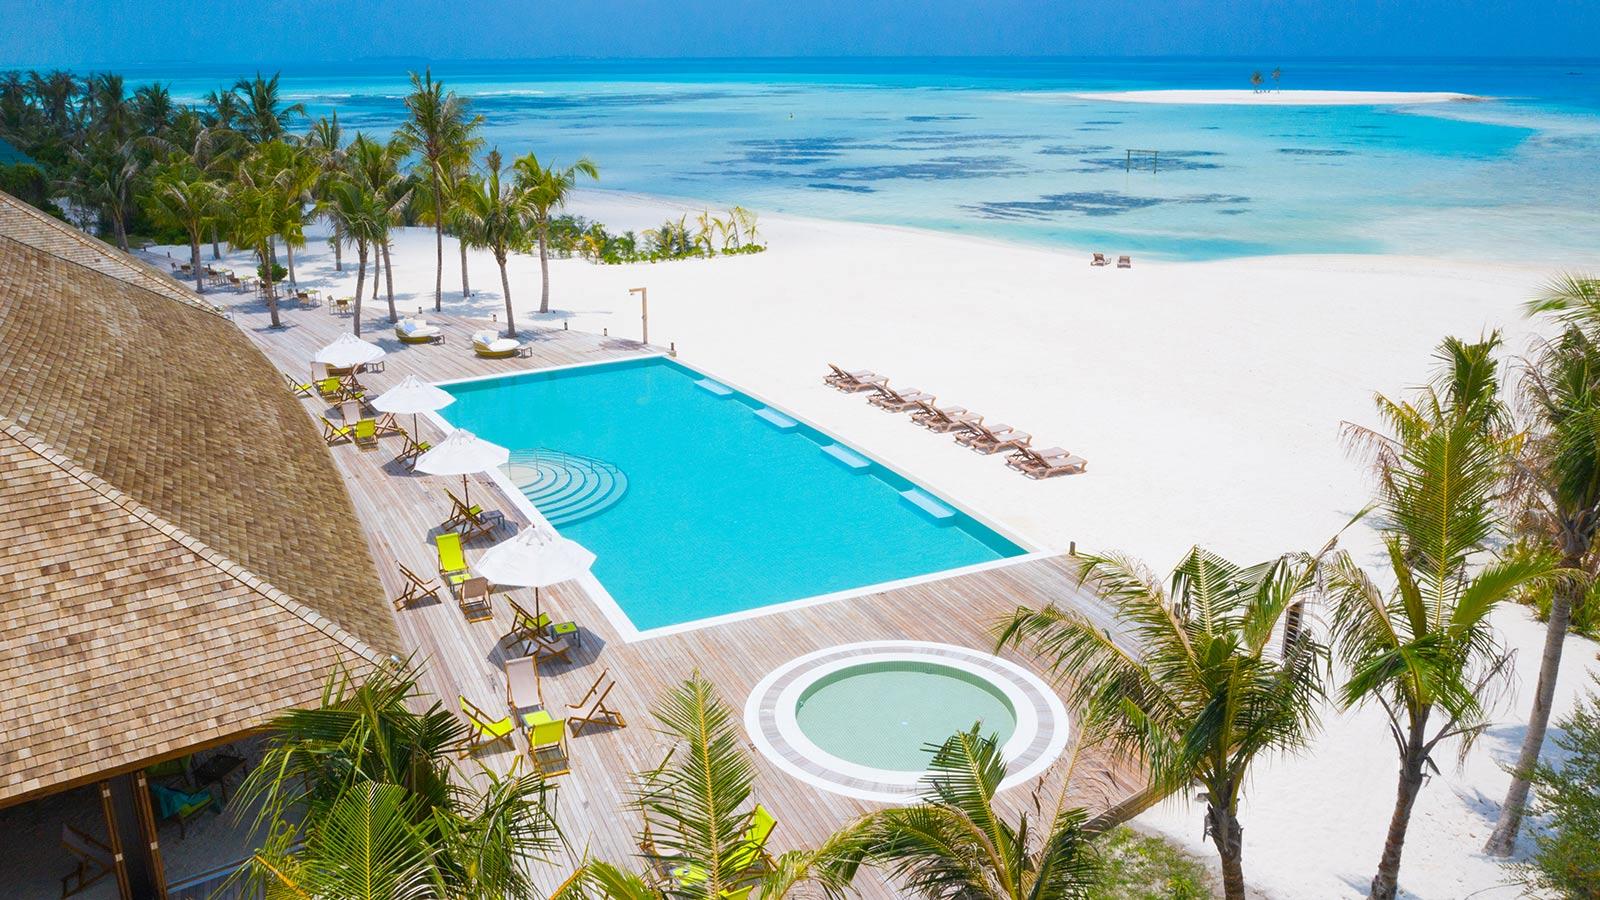 innahura's beach pool